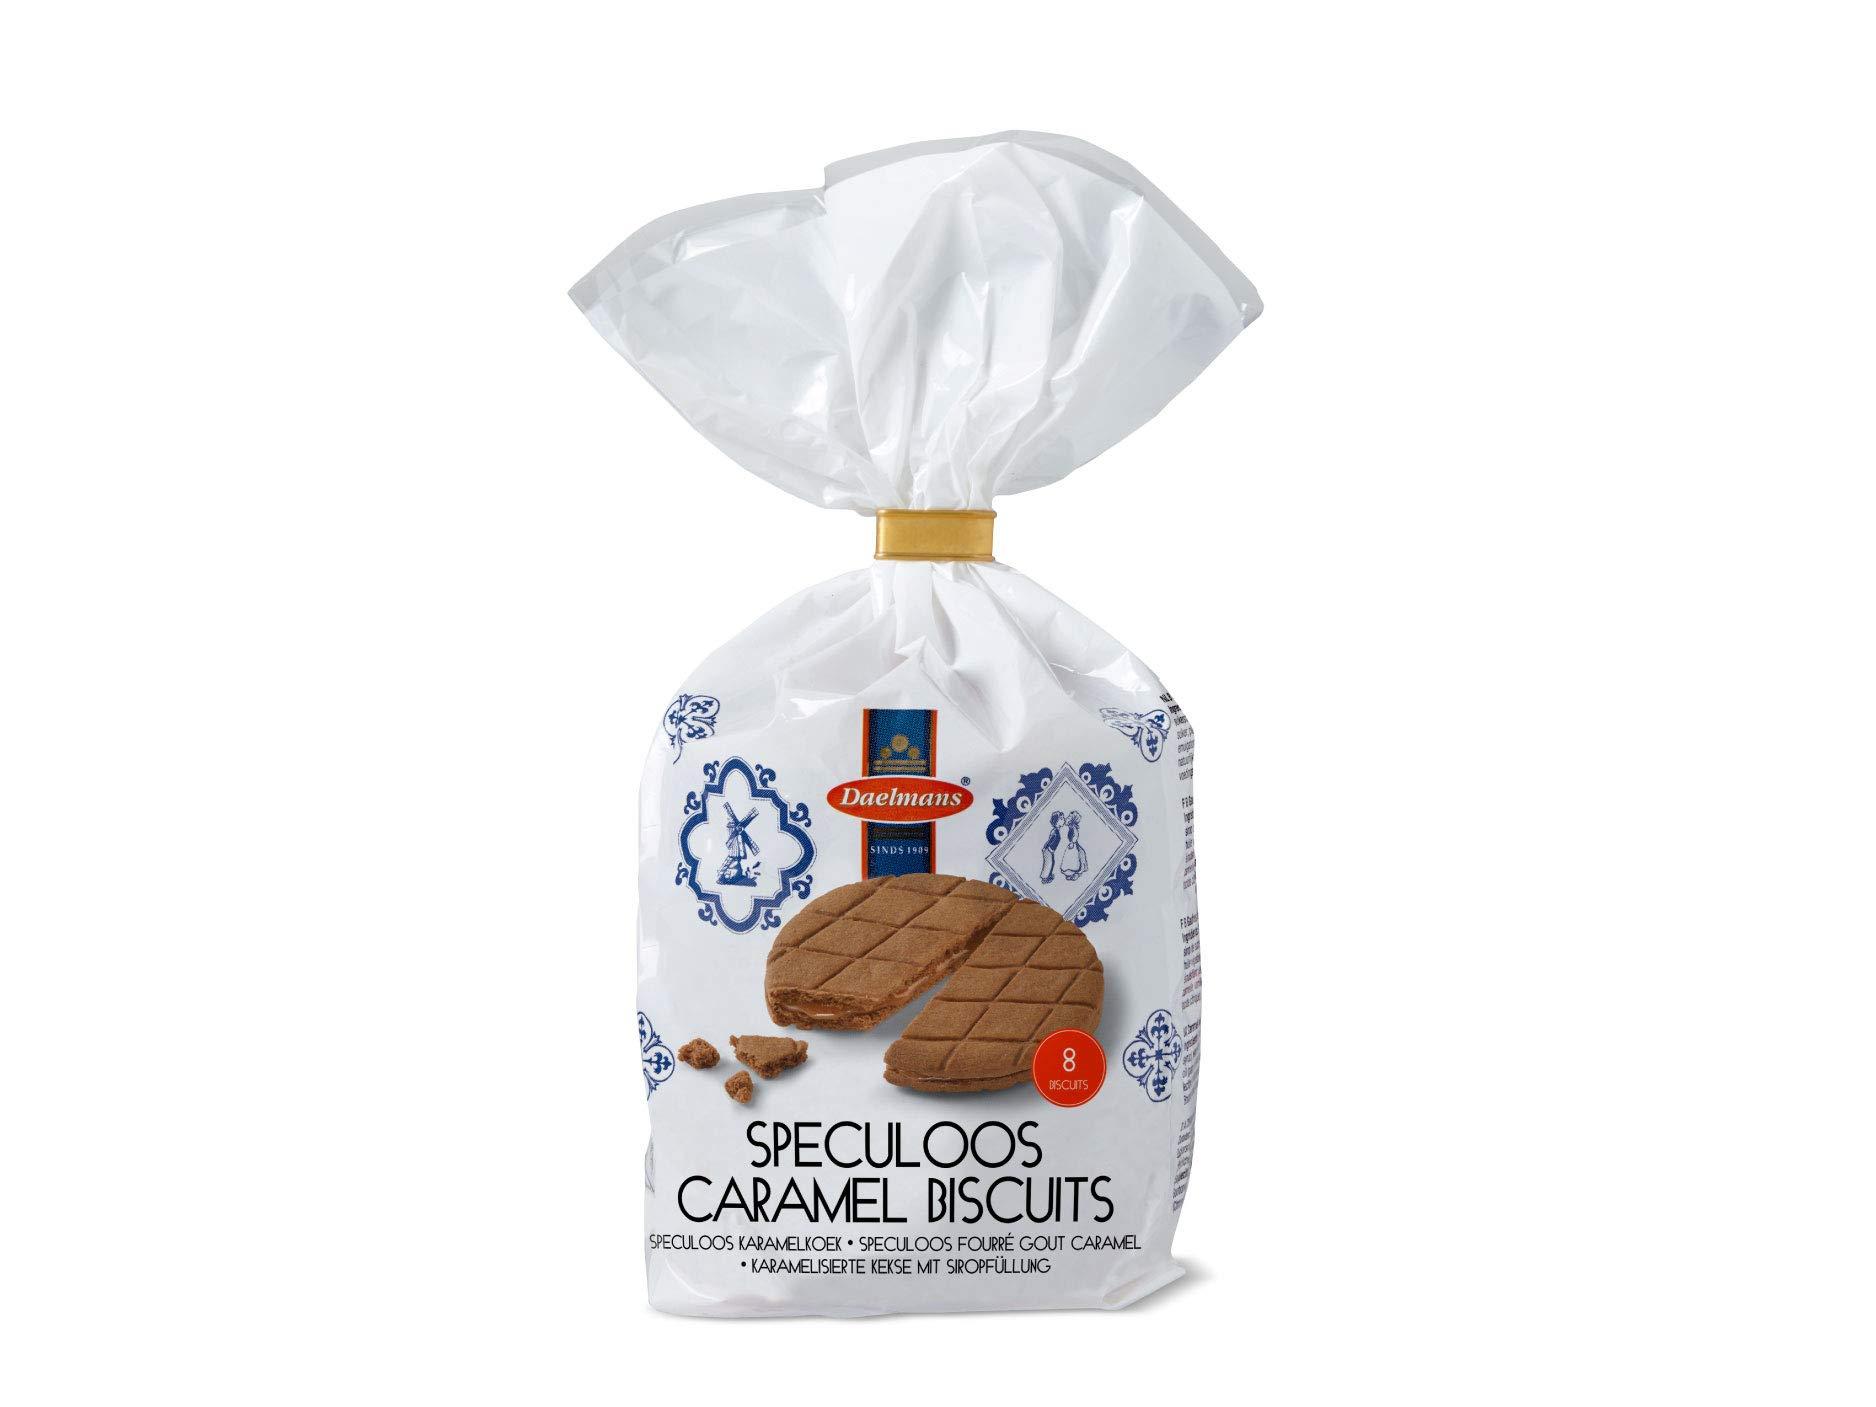 Daelmans Speculoos Caramel Biscuits in Clip Bag | 8 Biscuits per Bag